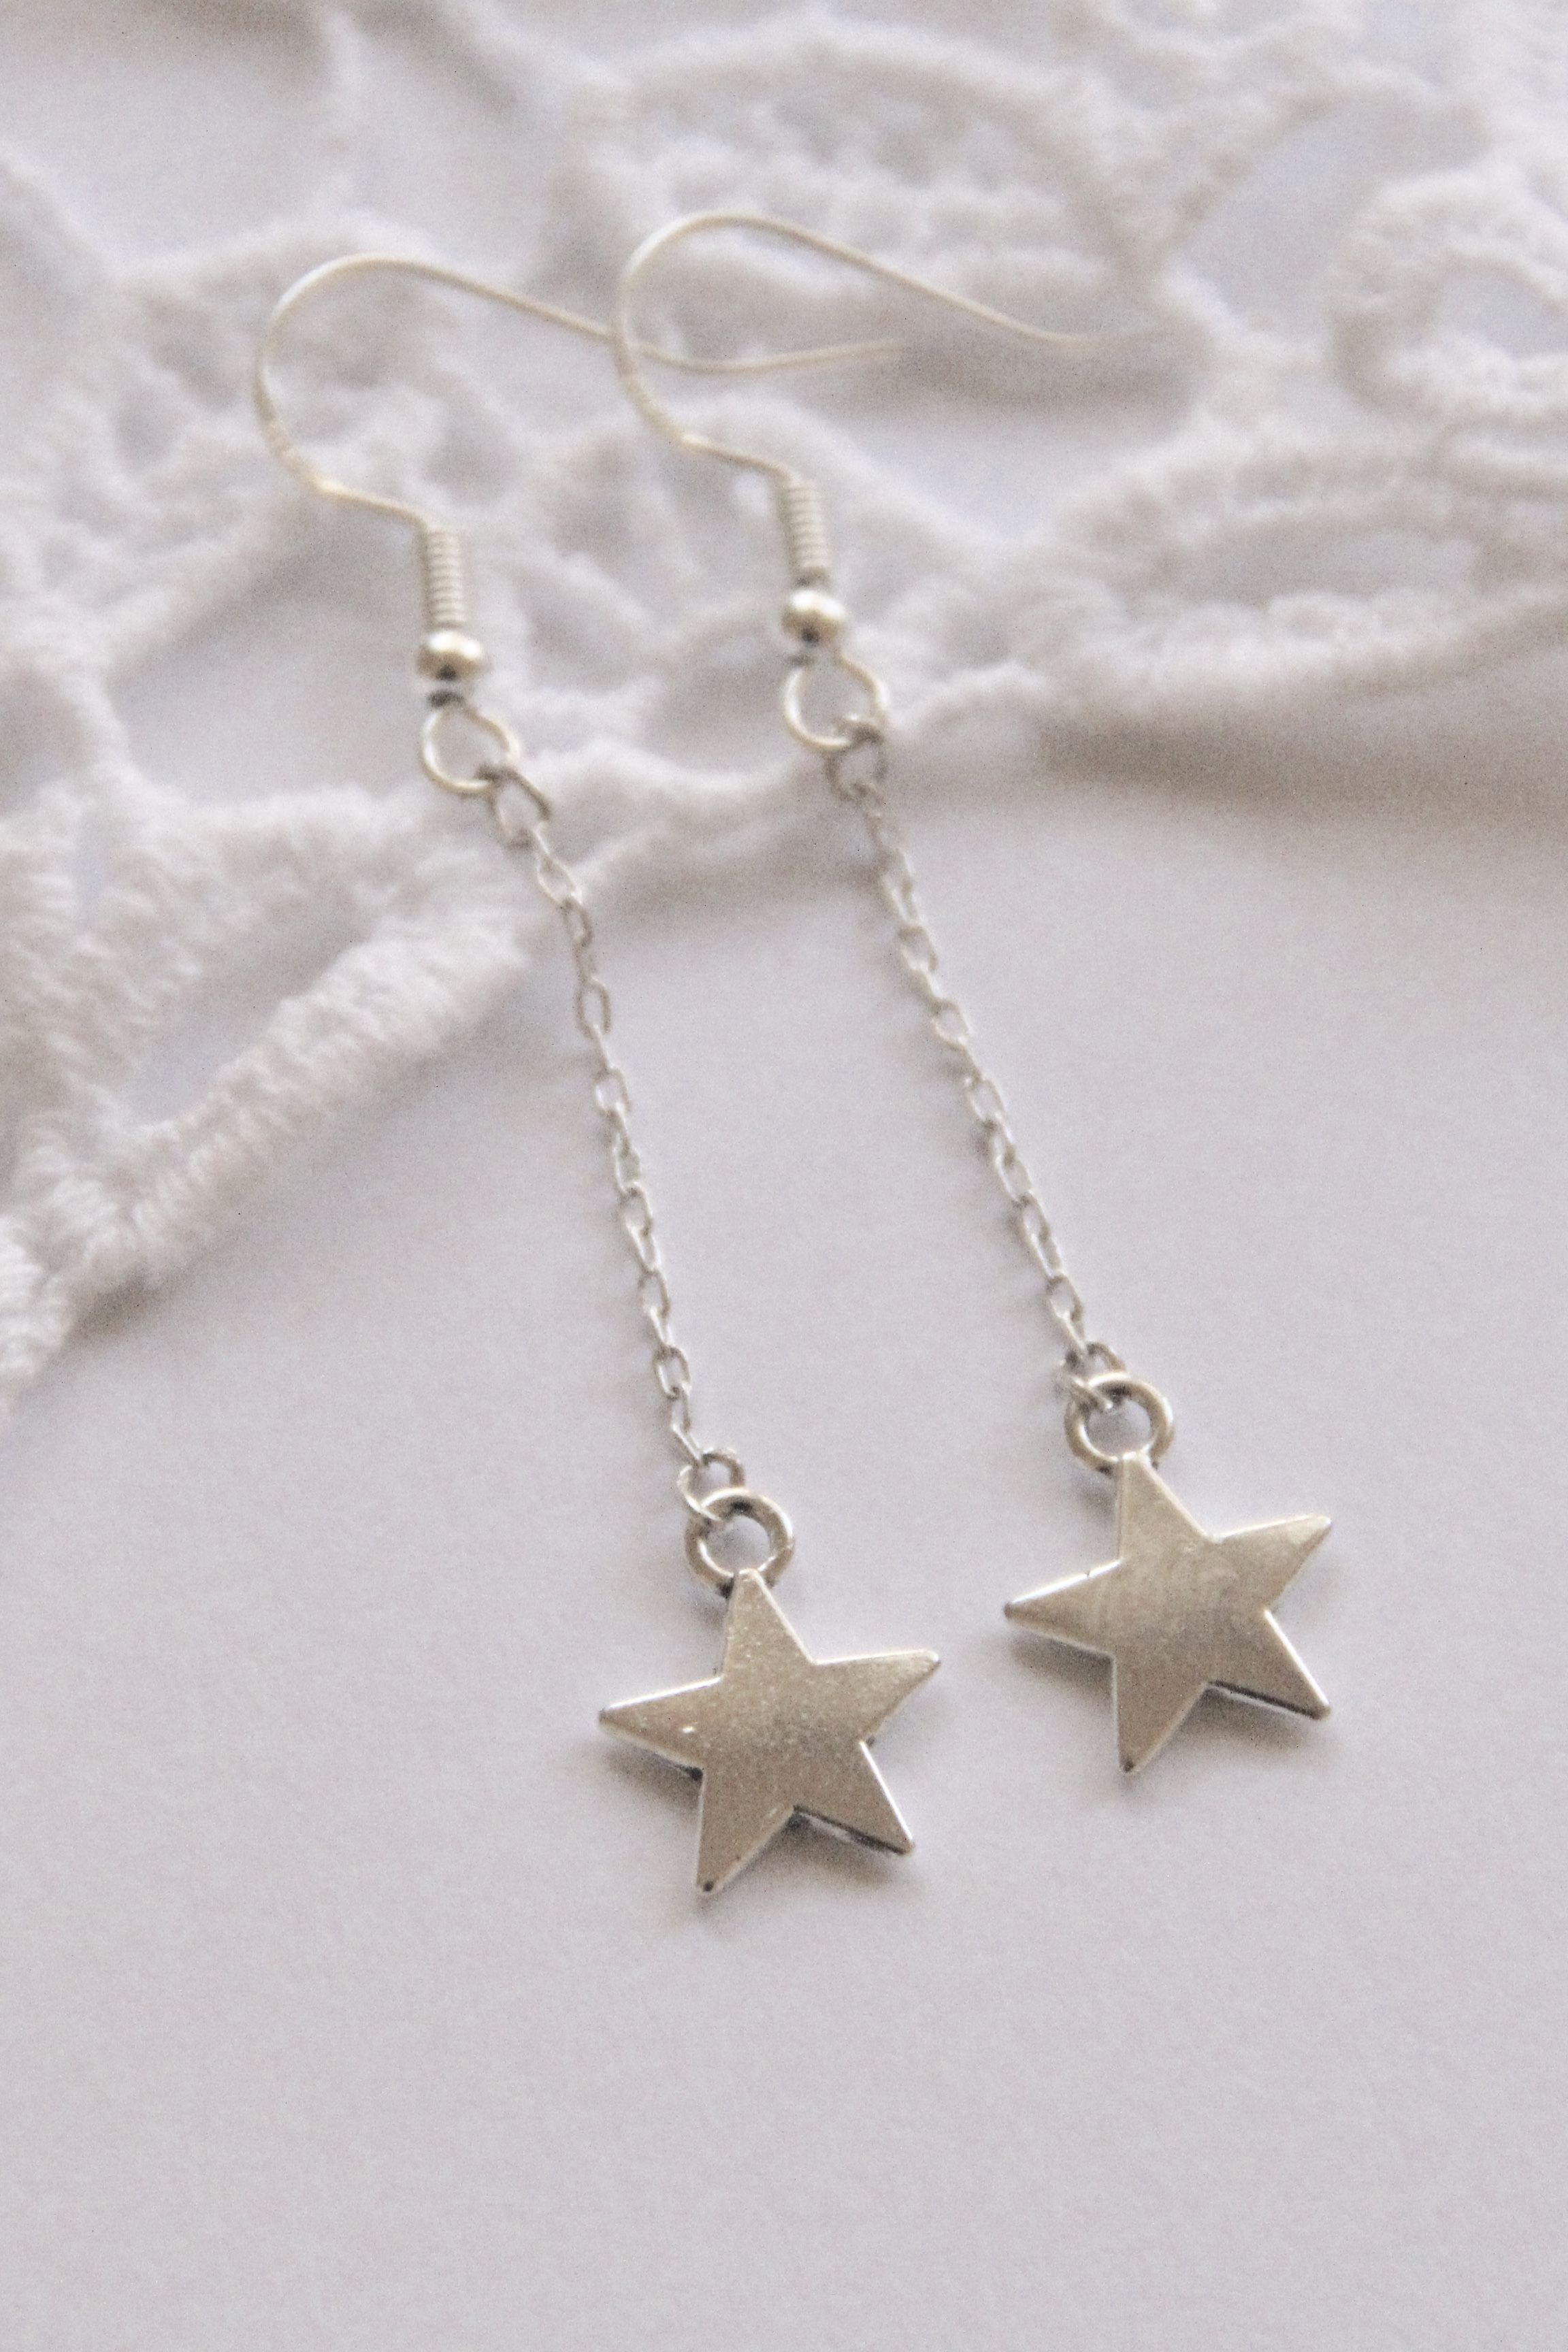 Stars Earrings  Pendants  Star  Jewelry  Fimo  Opal  Kawaii  Cute